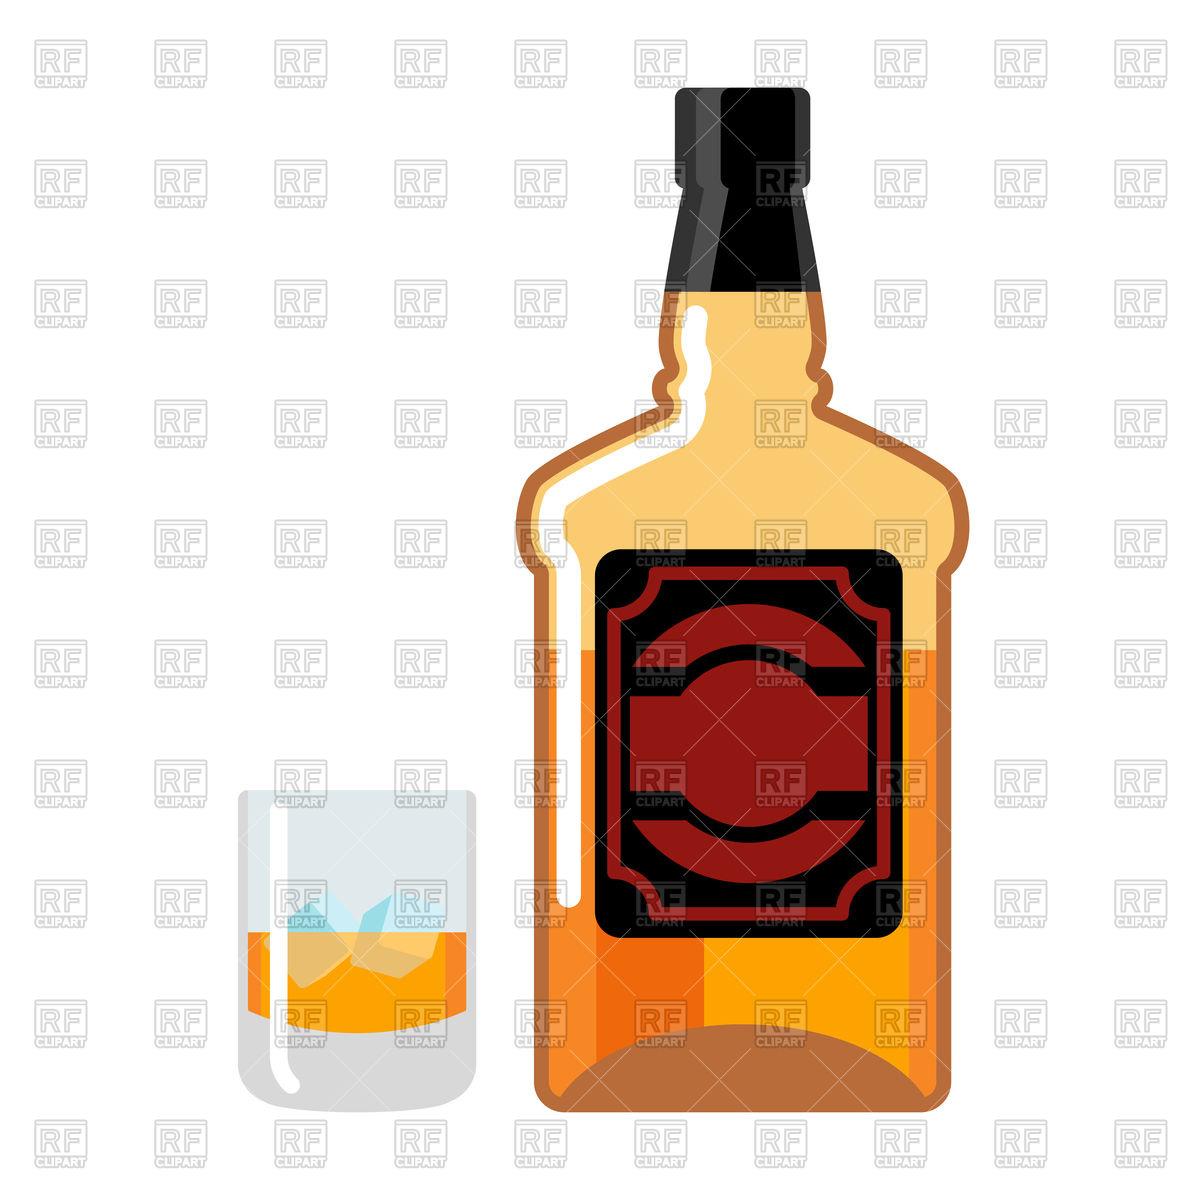 Whiskey bottle clipart 5 » Clipart Station.